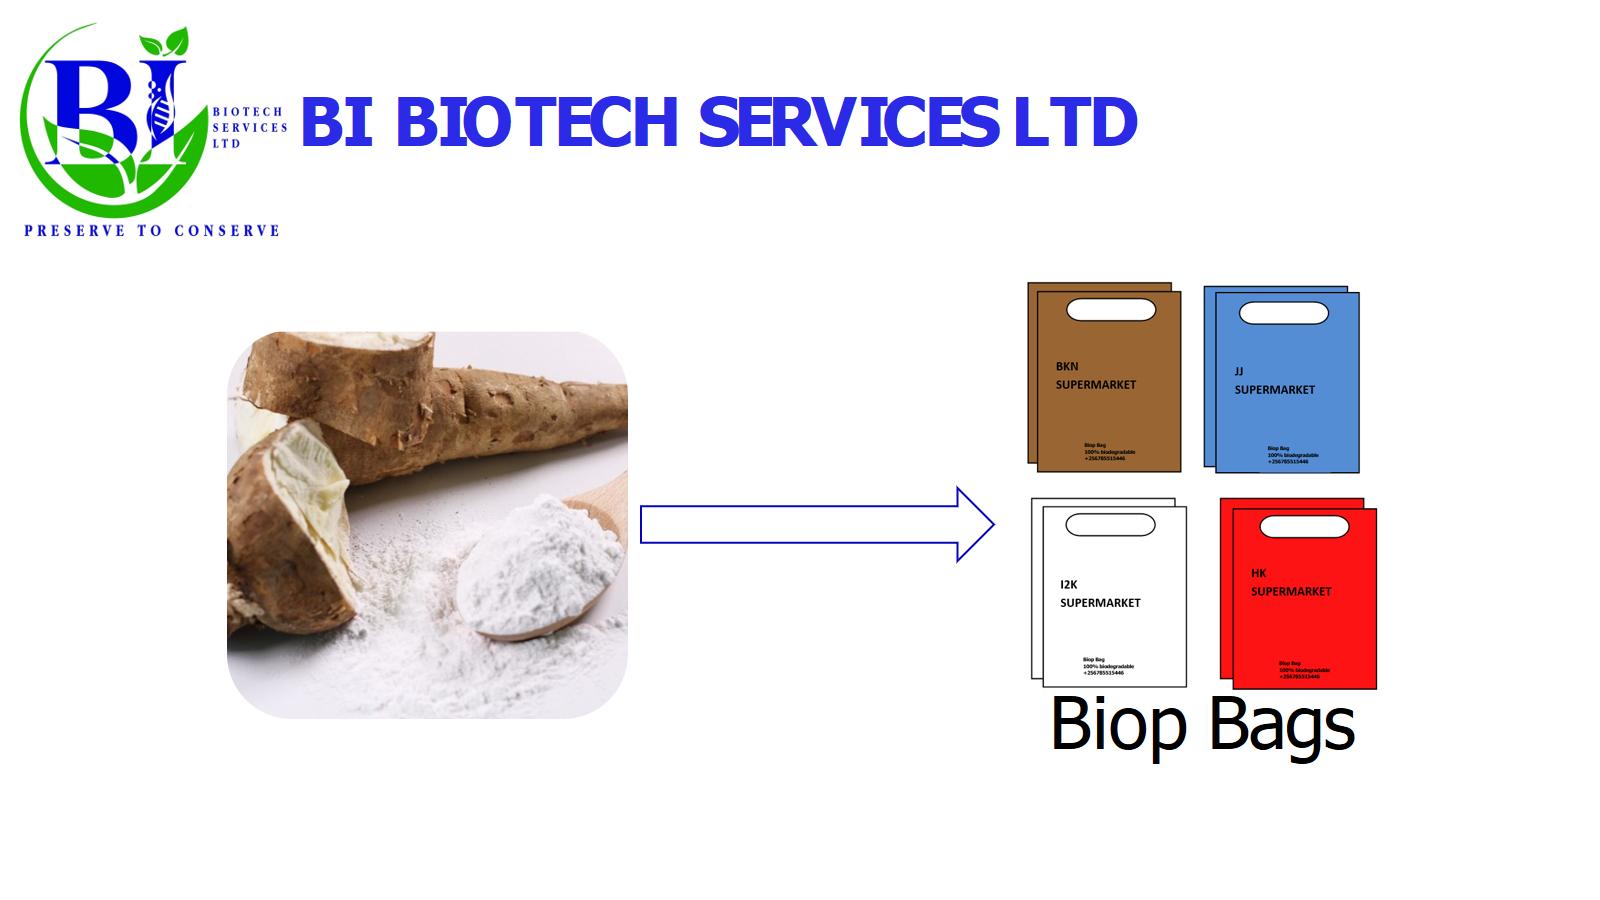 BI BIOTECH SERVICES LTD